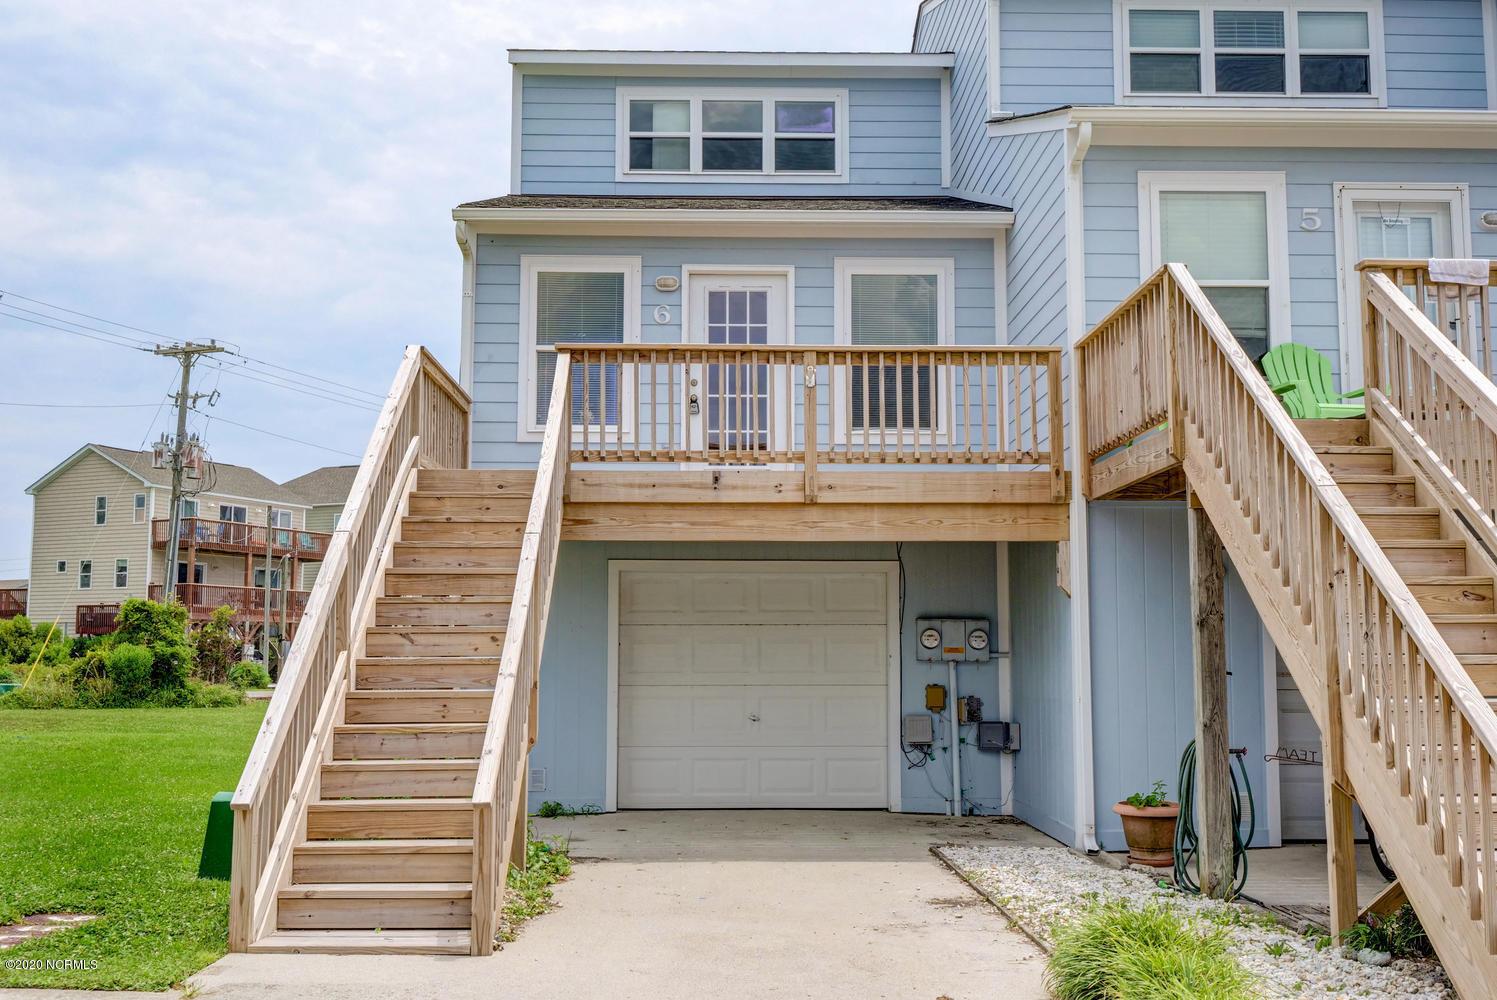 6 Bermuda Landing Place, North Topsail Beach, North Carolina 28460, 3 Bedrooms Bedrooms, ,2 BathroomsBathrooms,Residential,For Sale,Bermuda Landing,100227113